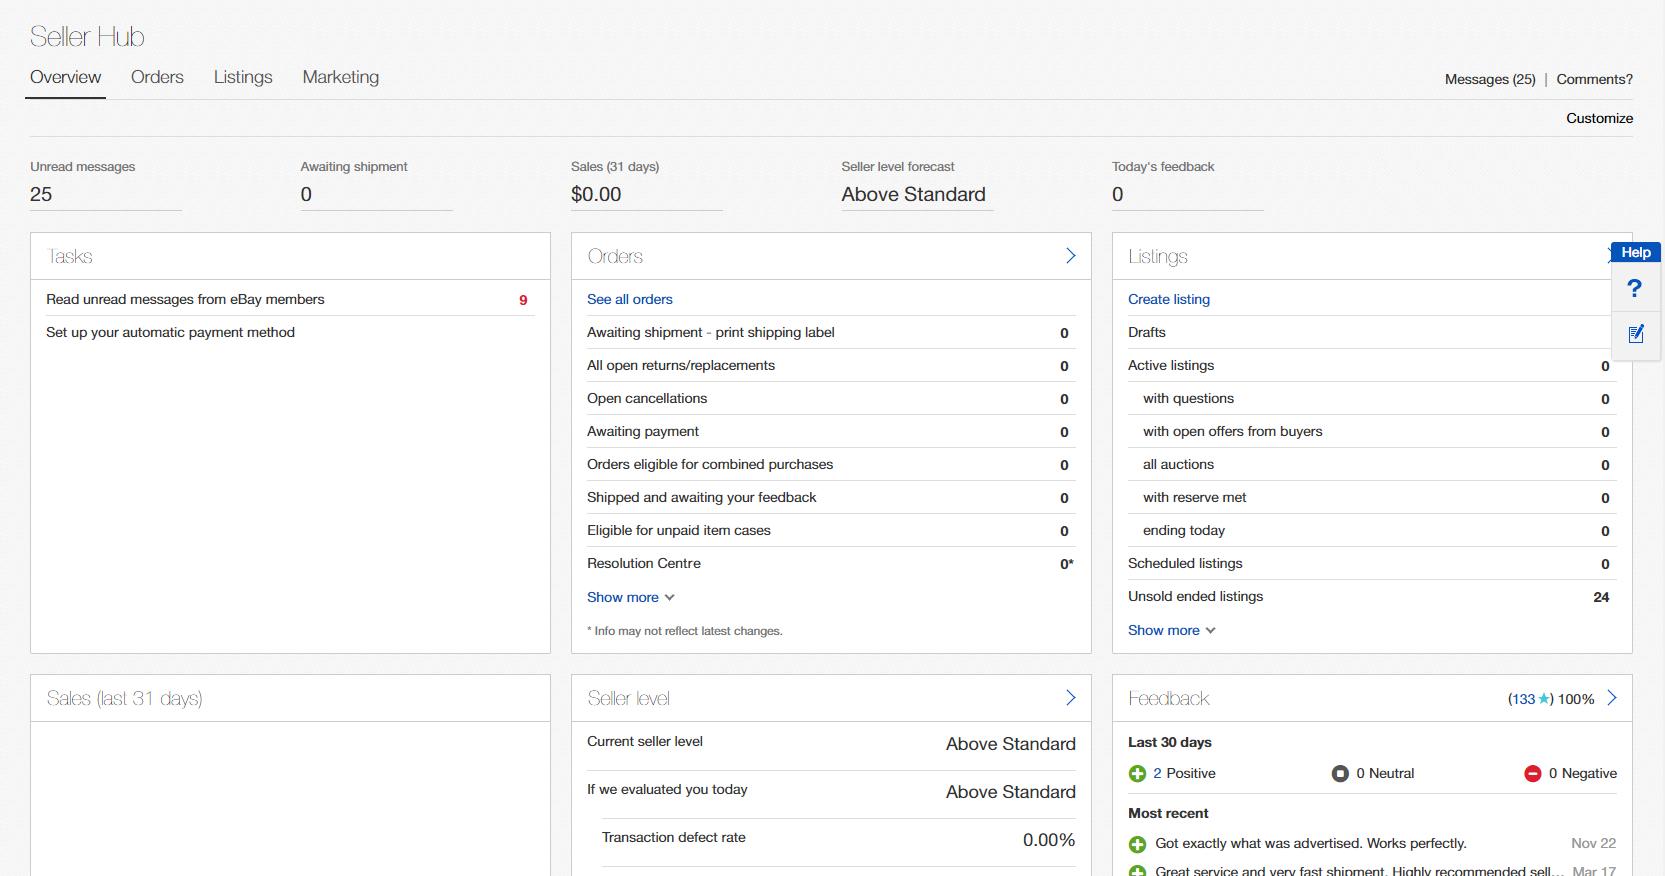 Seller Hub Overview tab